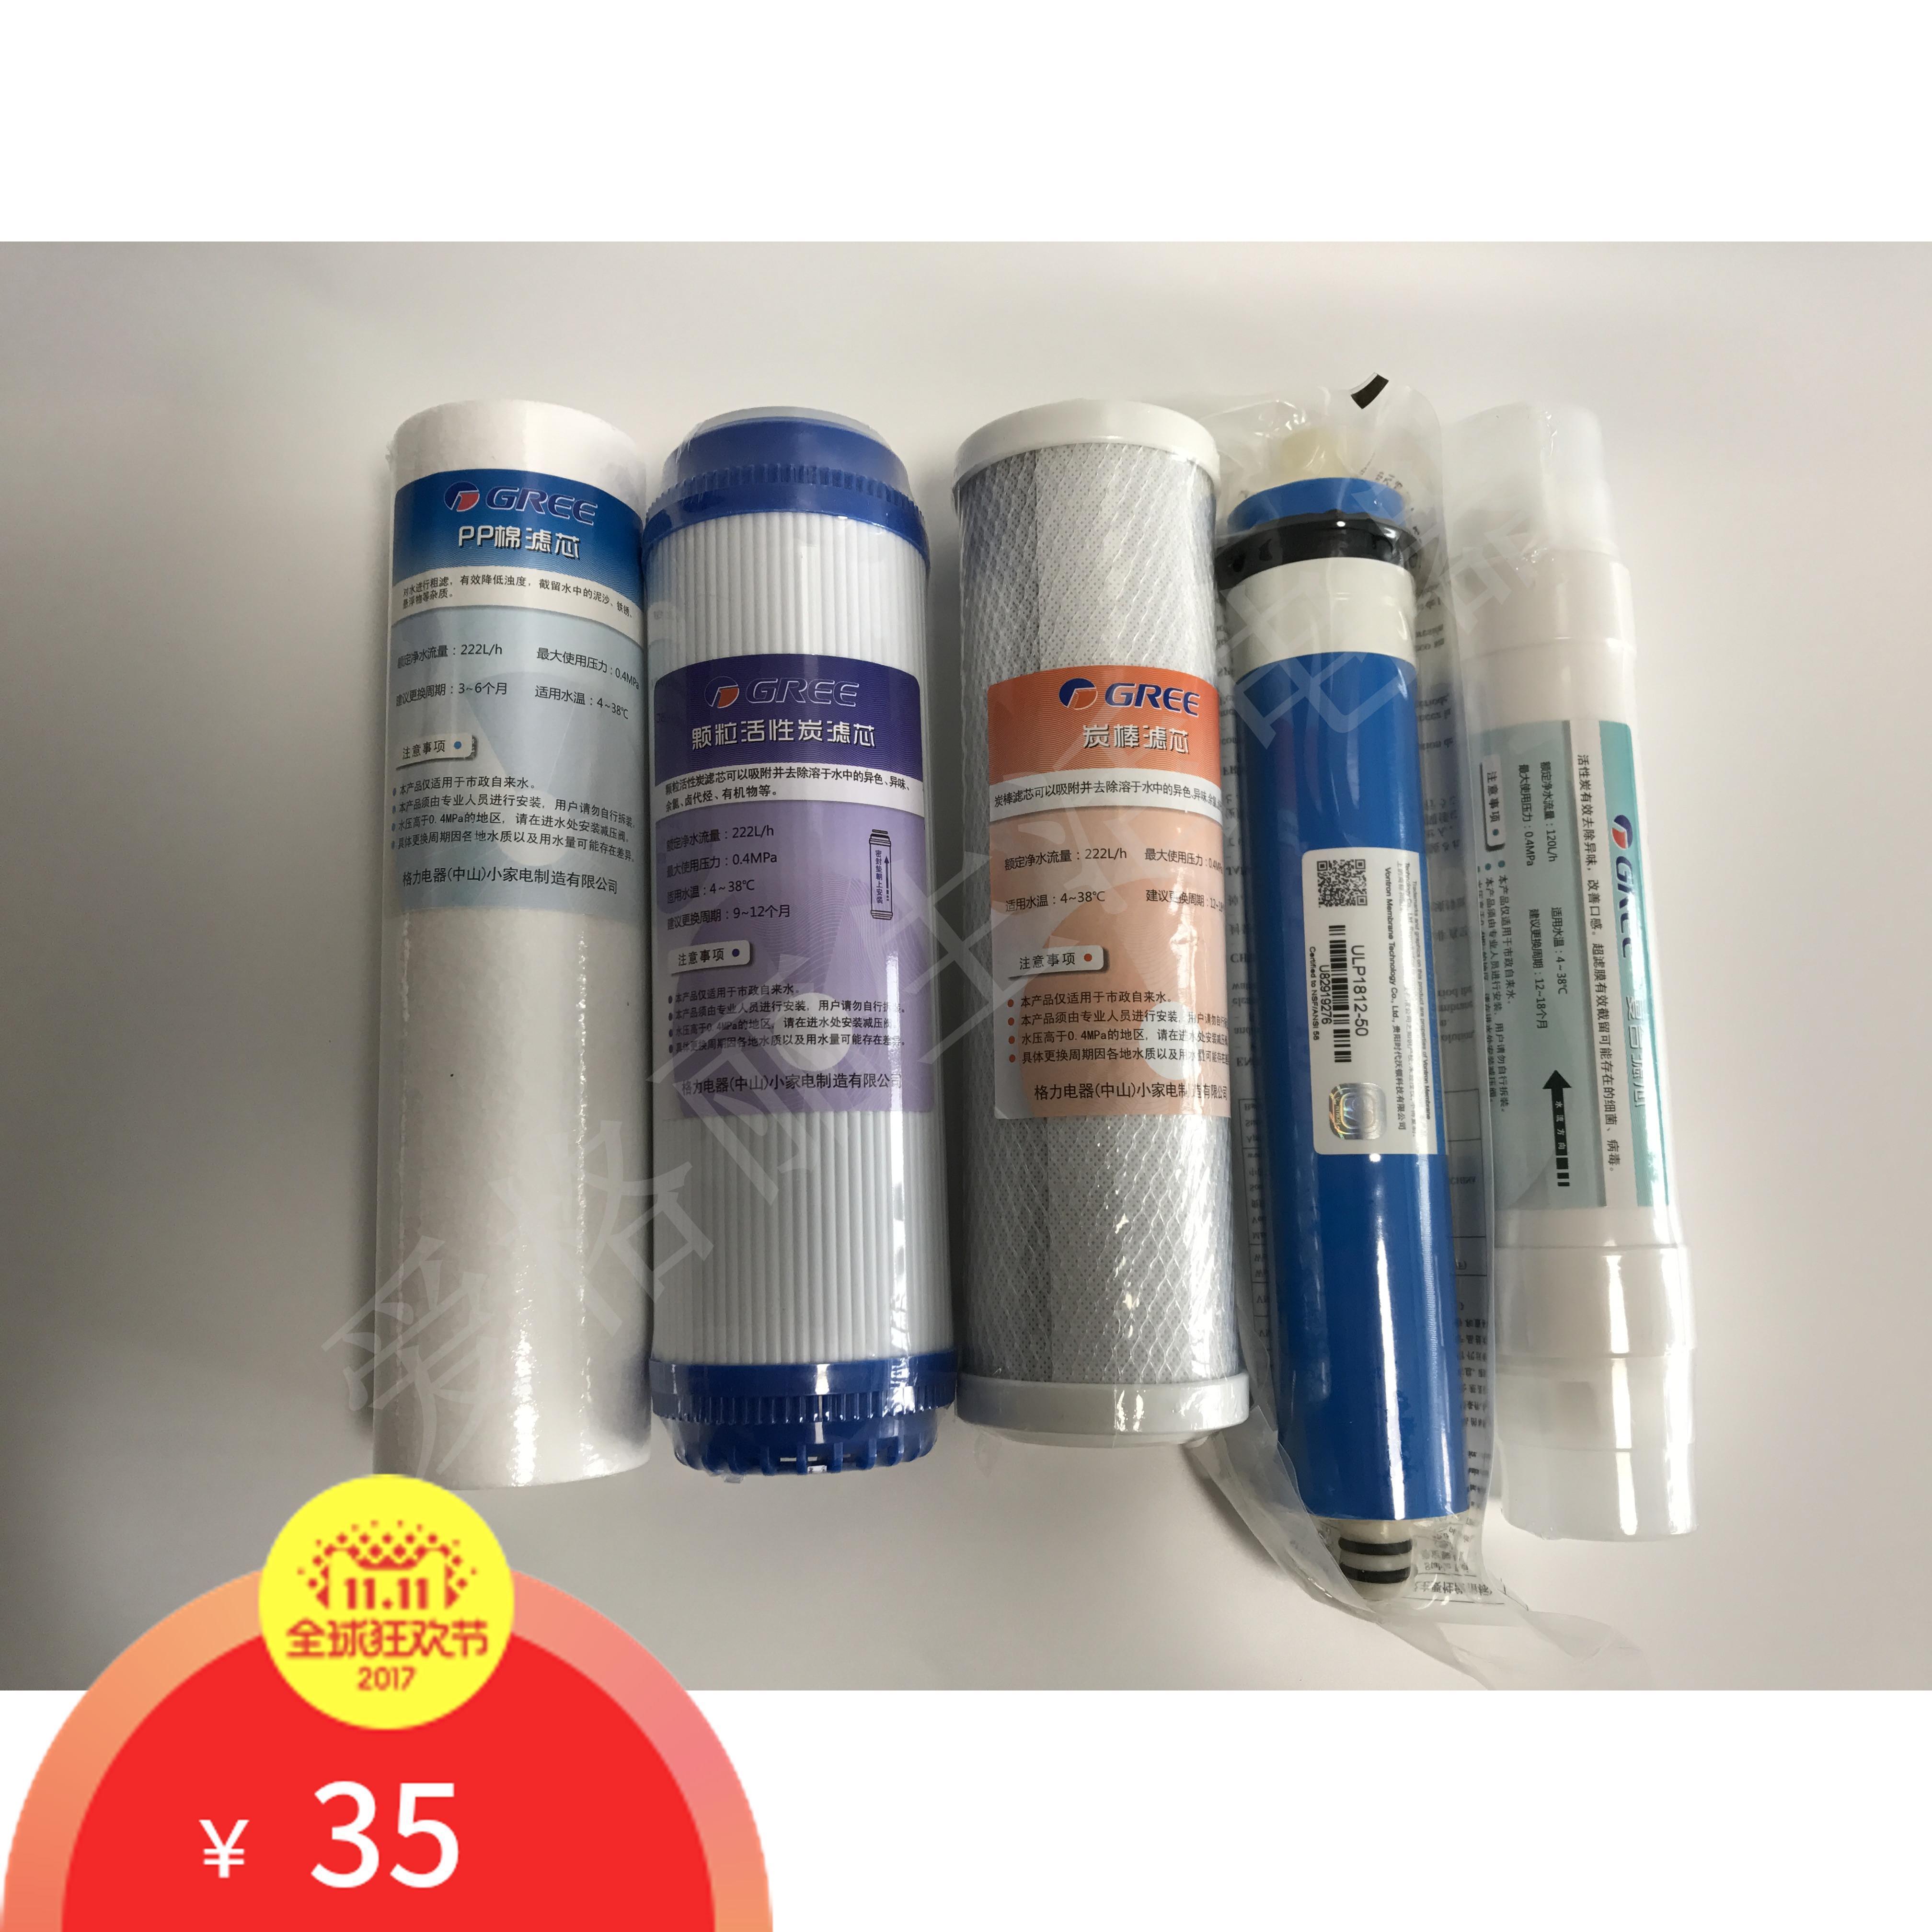 GREE umkehrosmose wasserfilter Original Filter - Baumwolle körnige aktivkohle - Filter ro film Universal kohlenstoff.